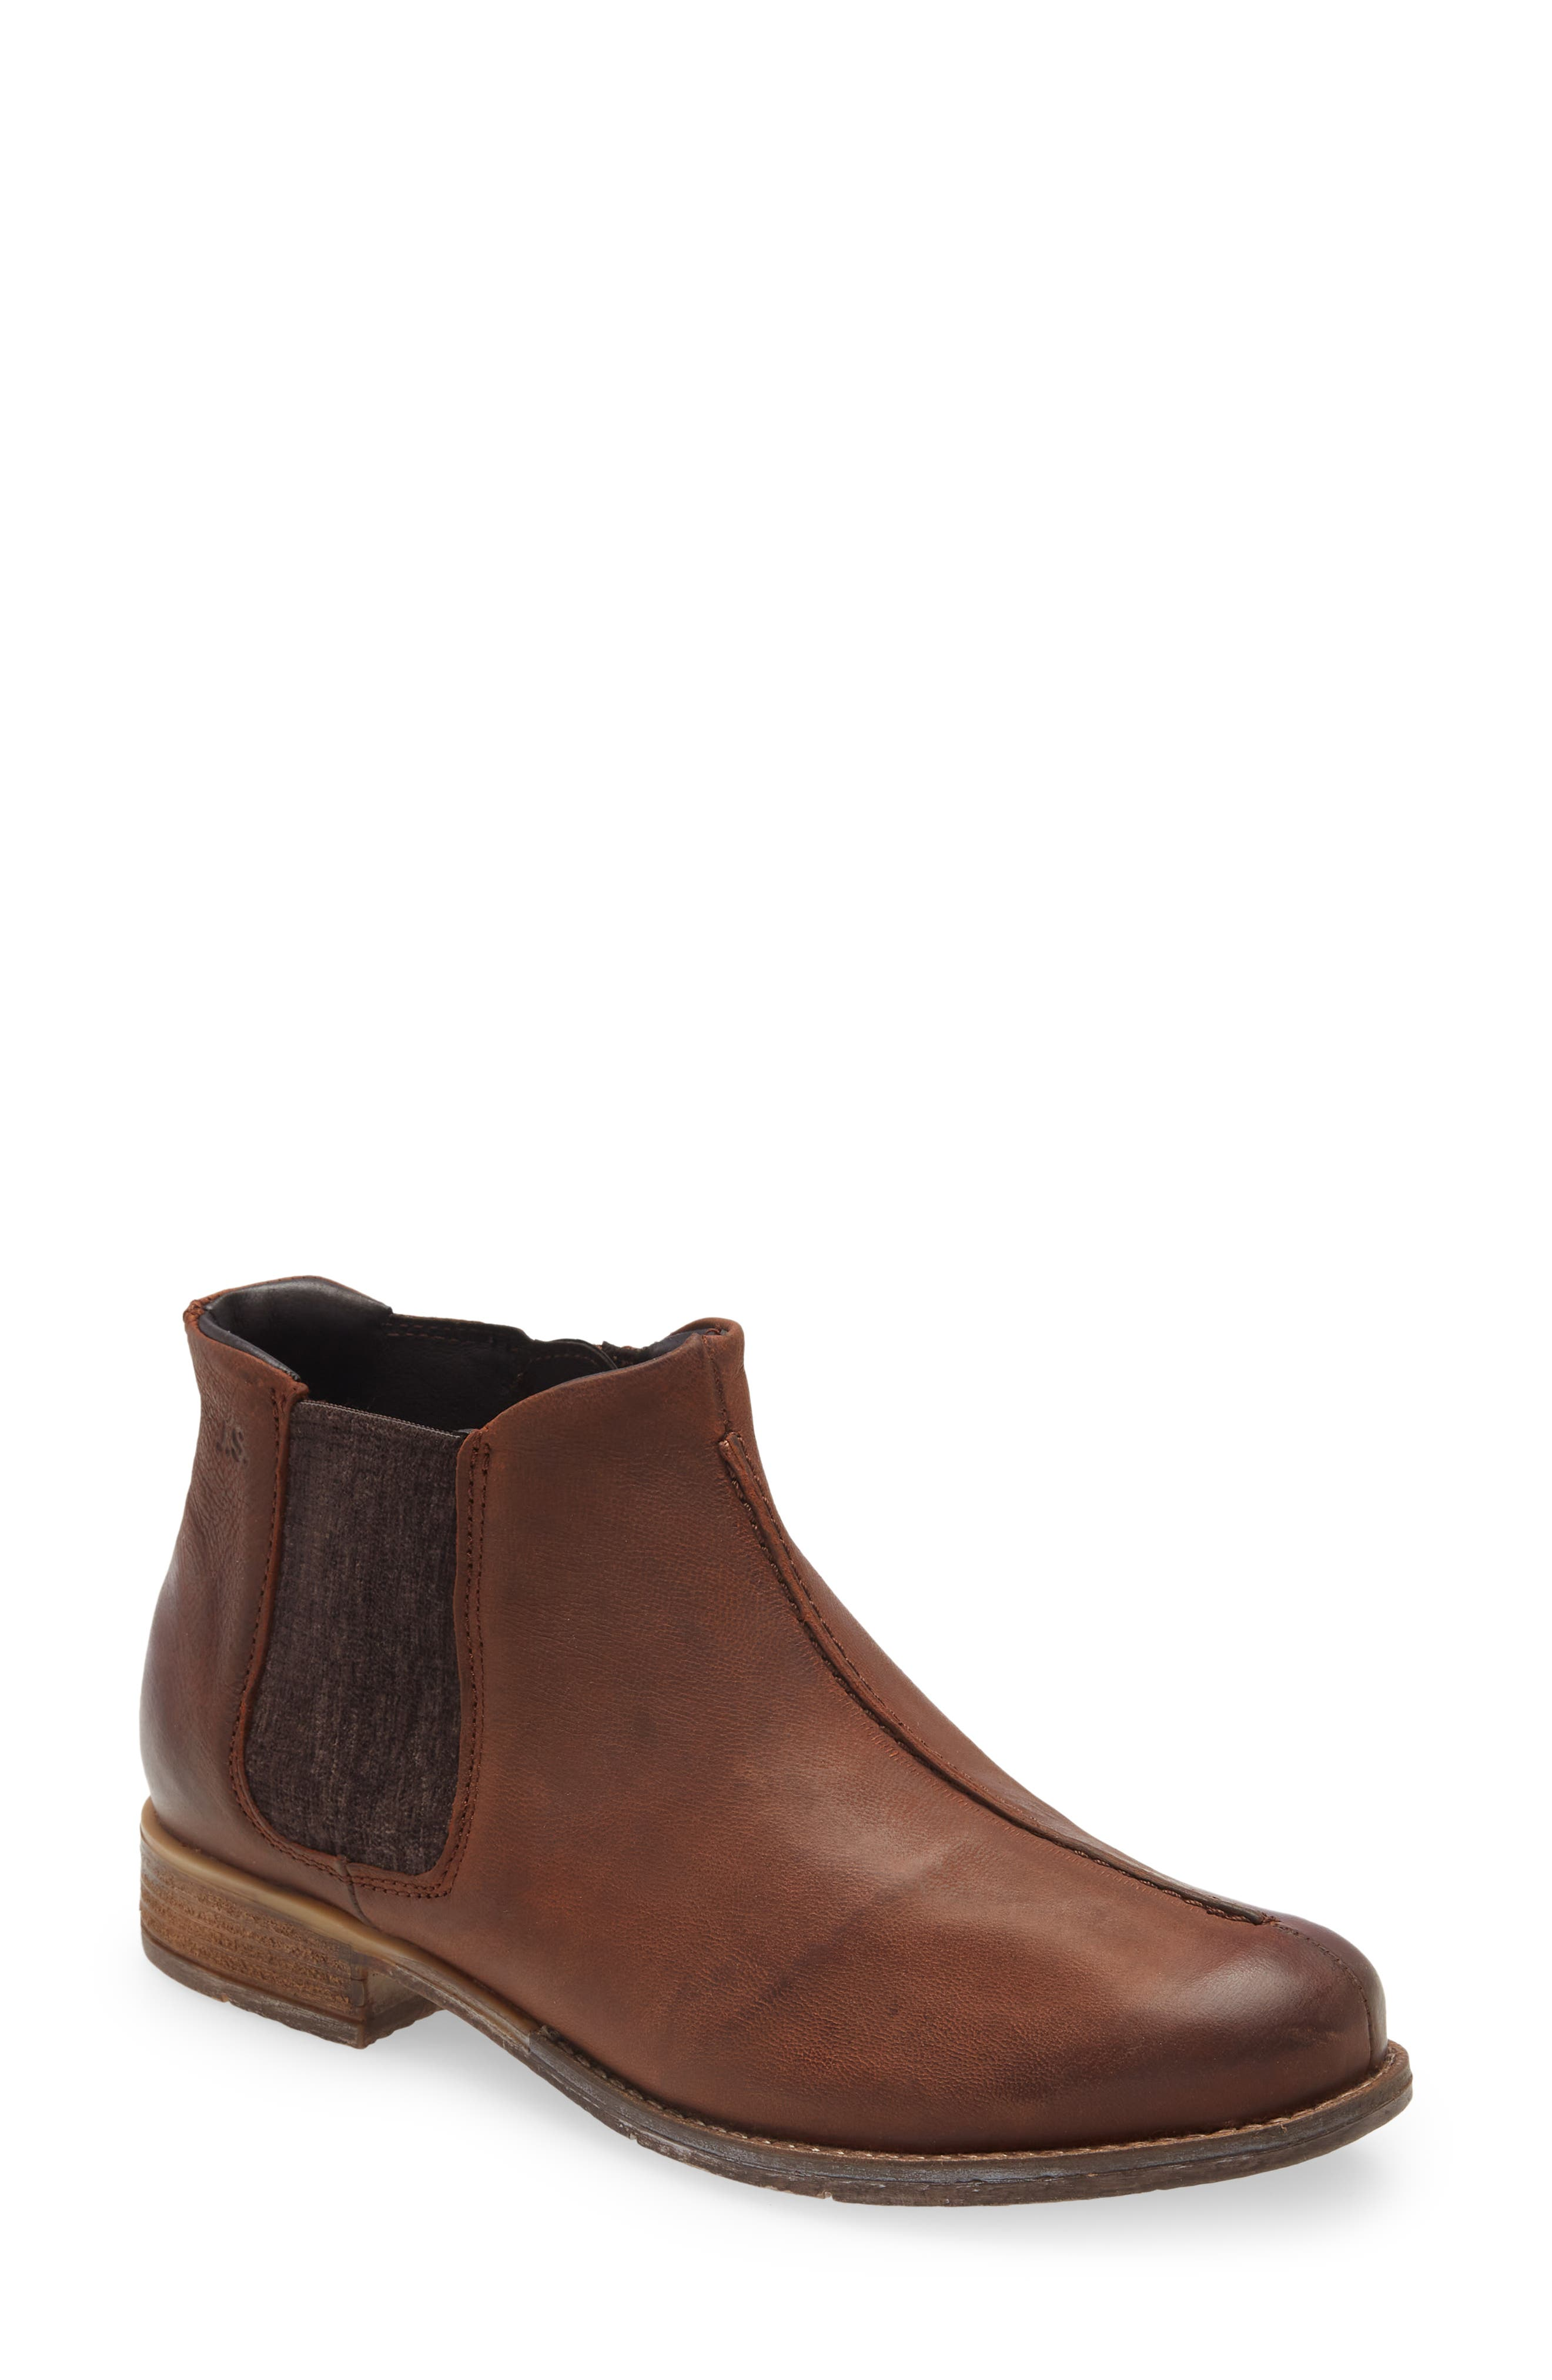 Sienna Chelsea Boot